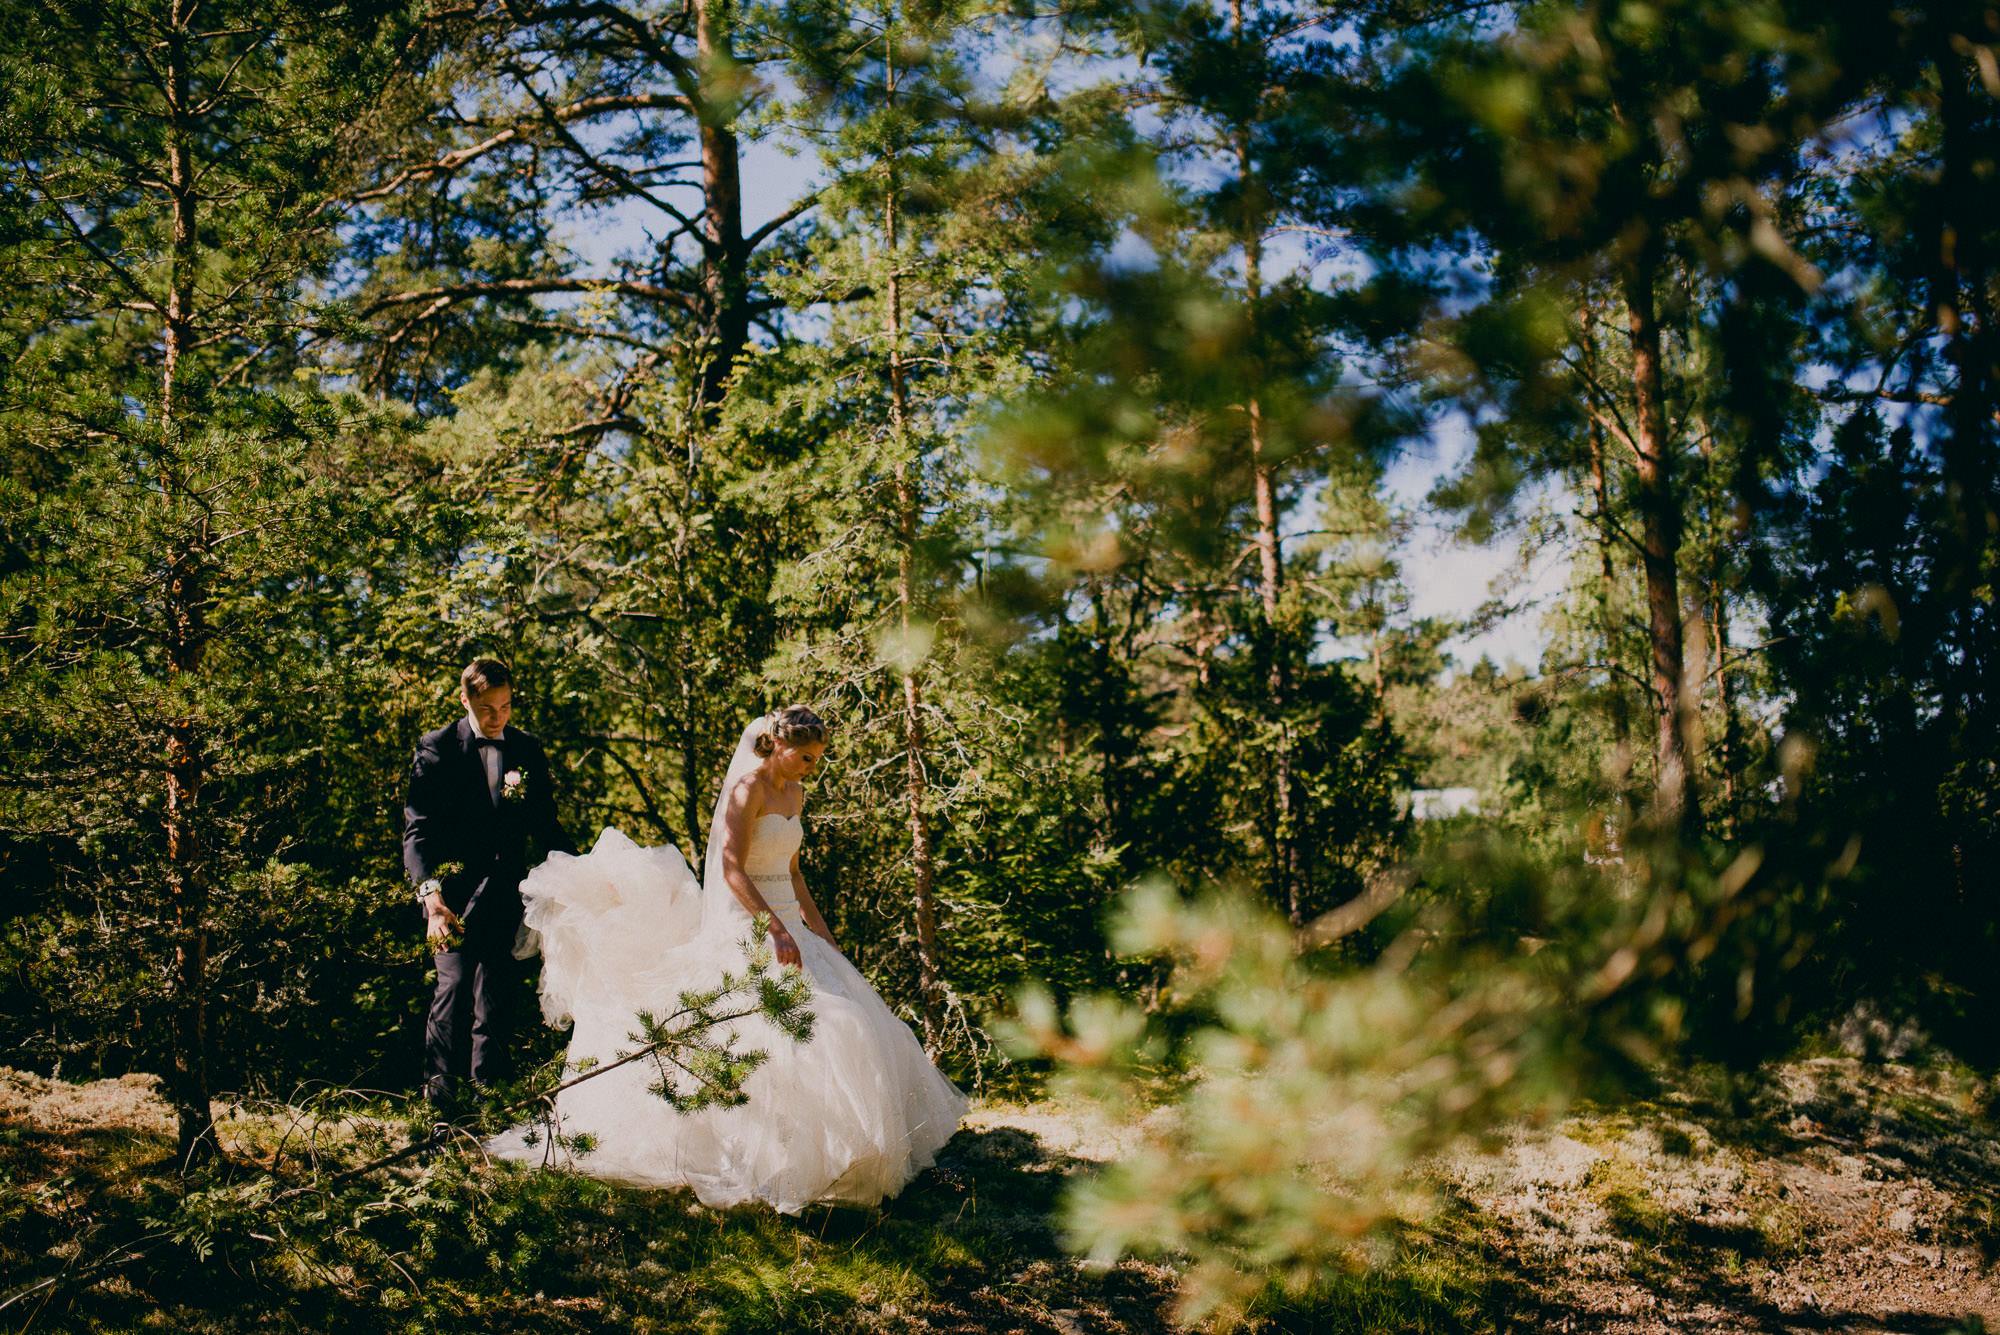 rabbit_visuals_haavideo_wedding_videography_el-004.jpg